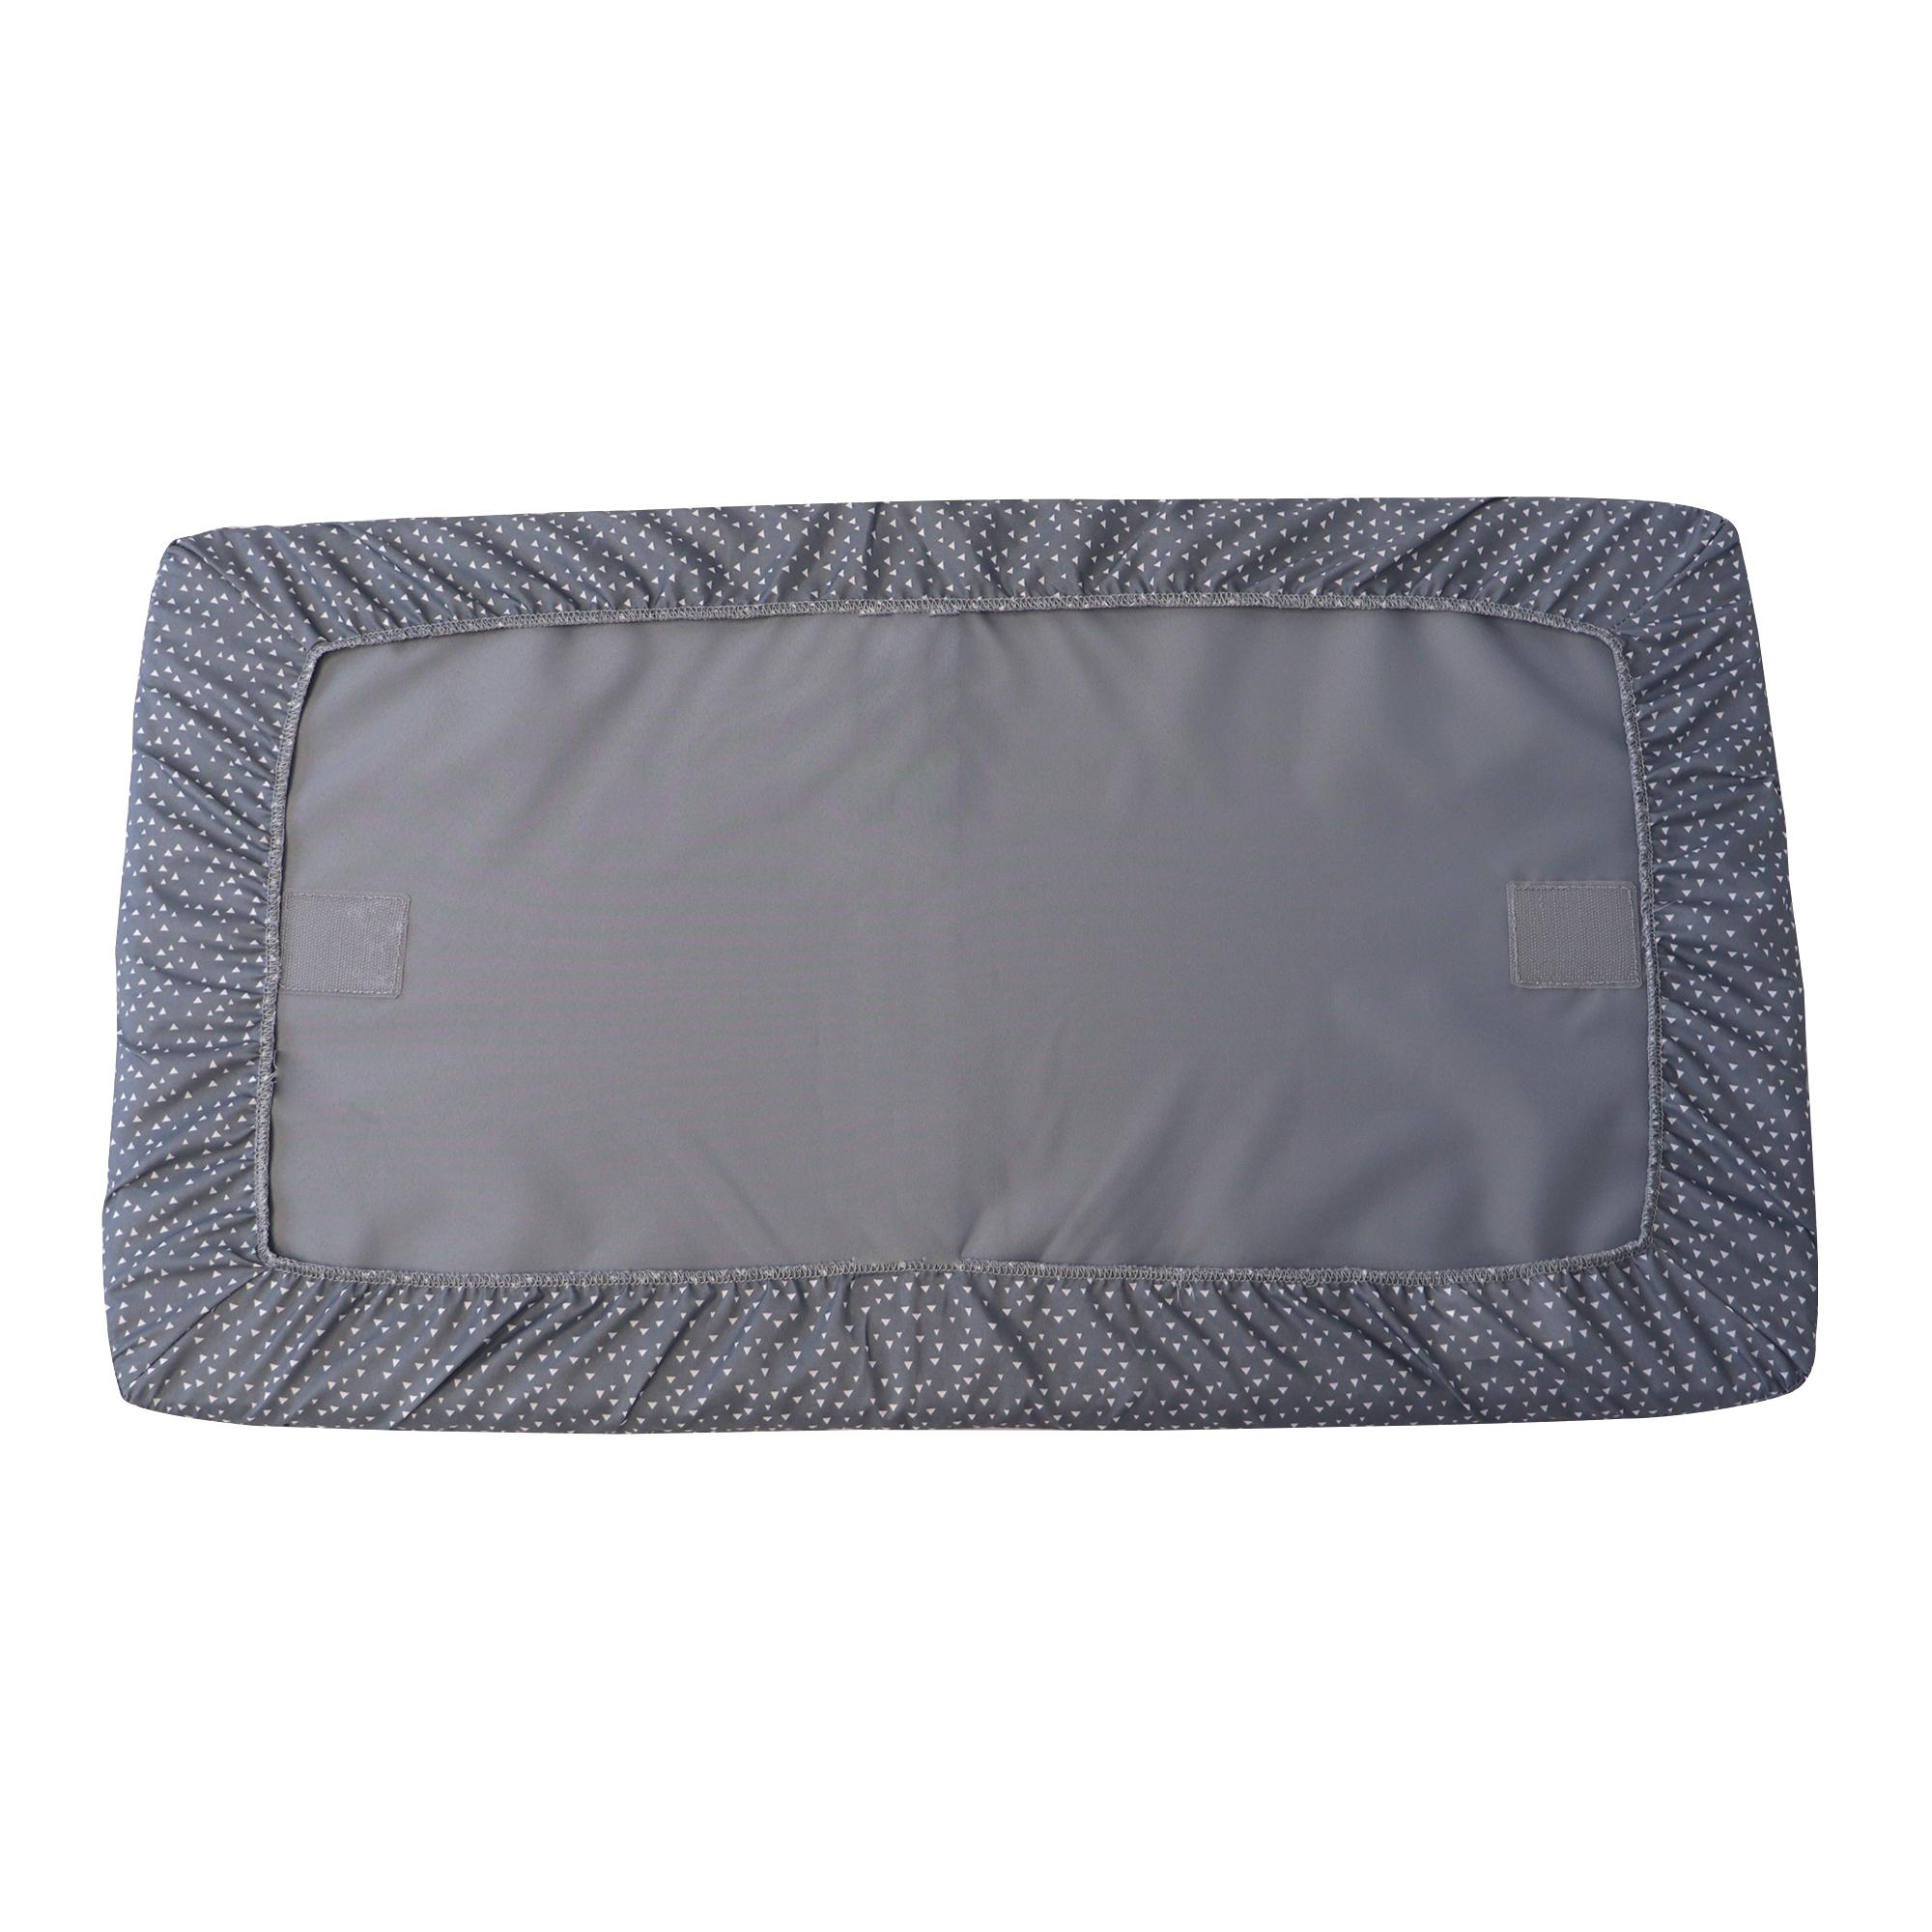 Kolcraft Fitted Bassinet Sheet bottom